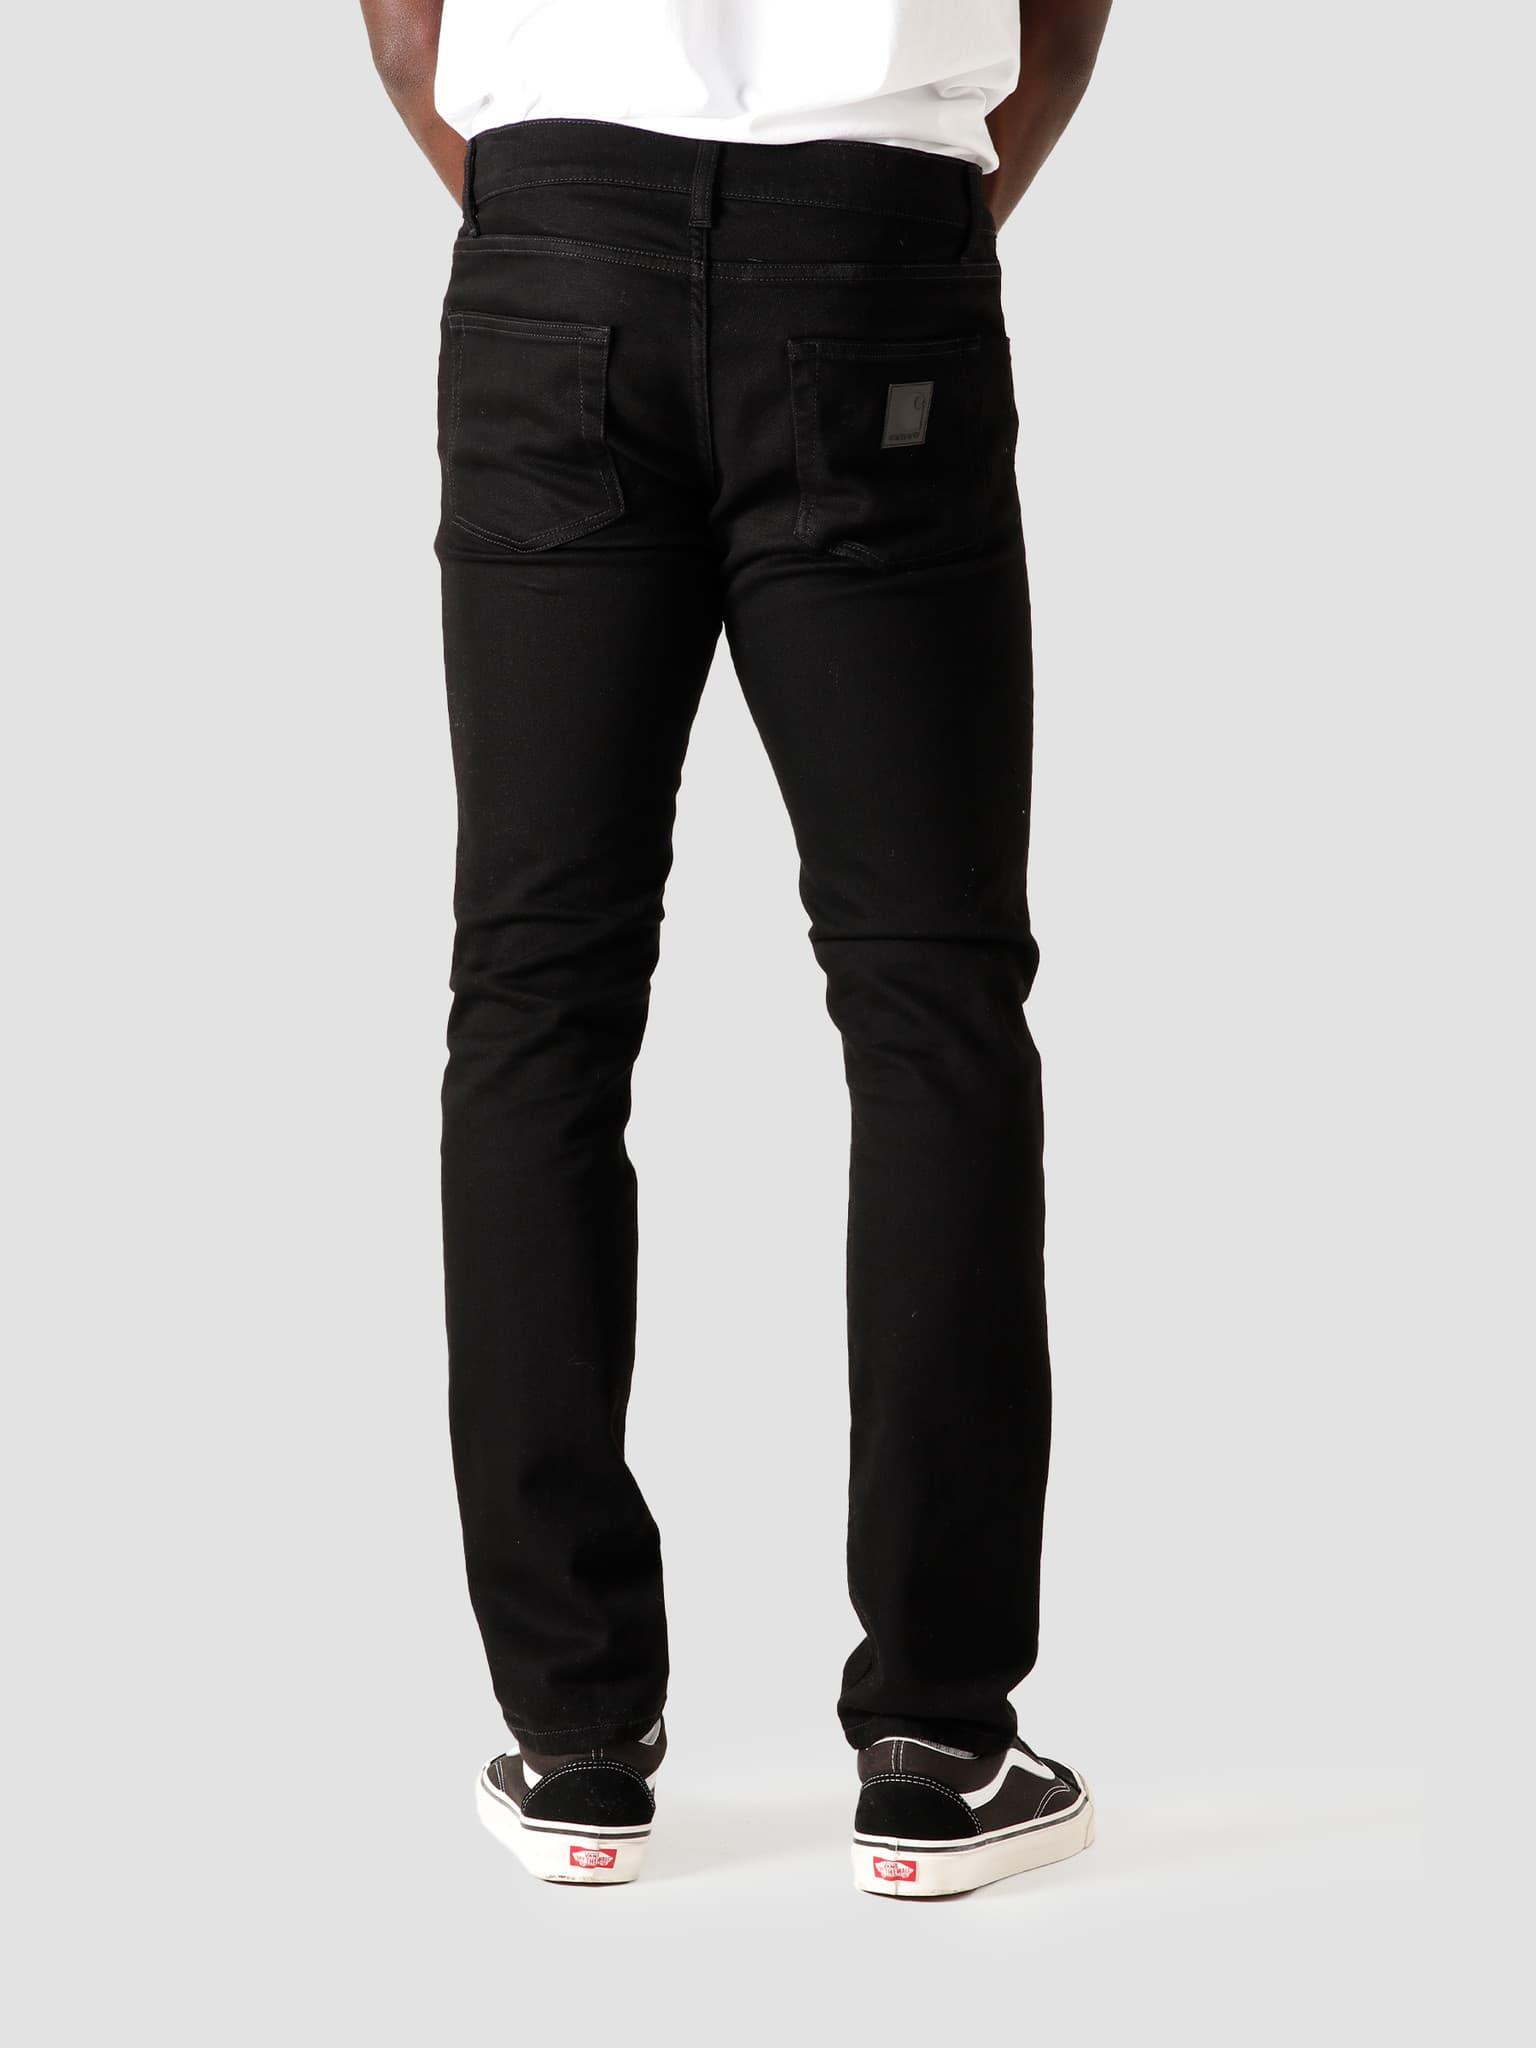 Rebel Pant Rinsed Black I024947-8902